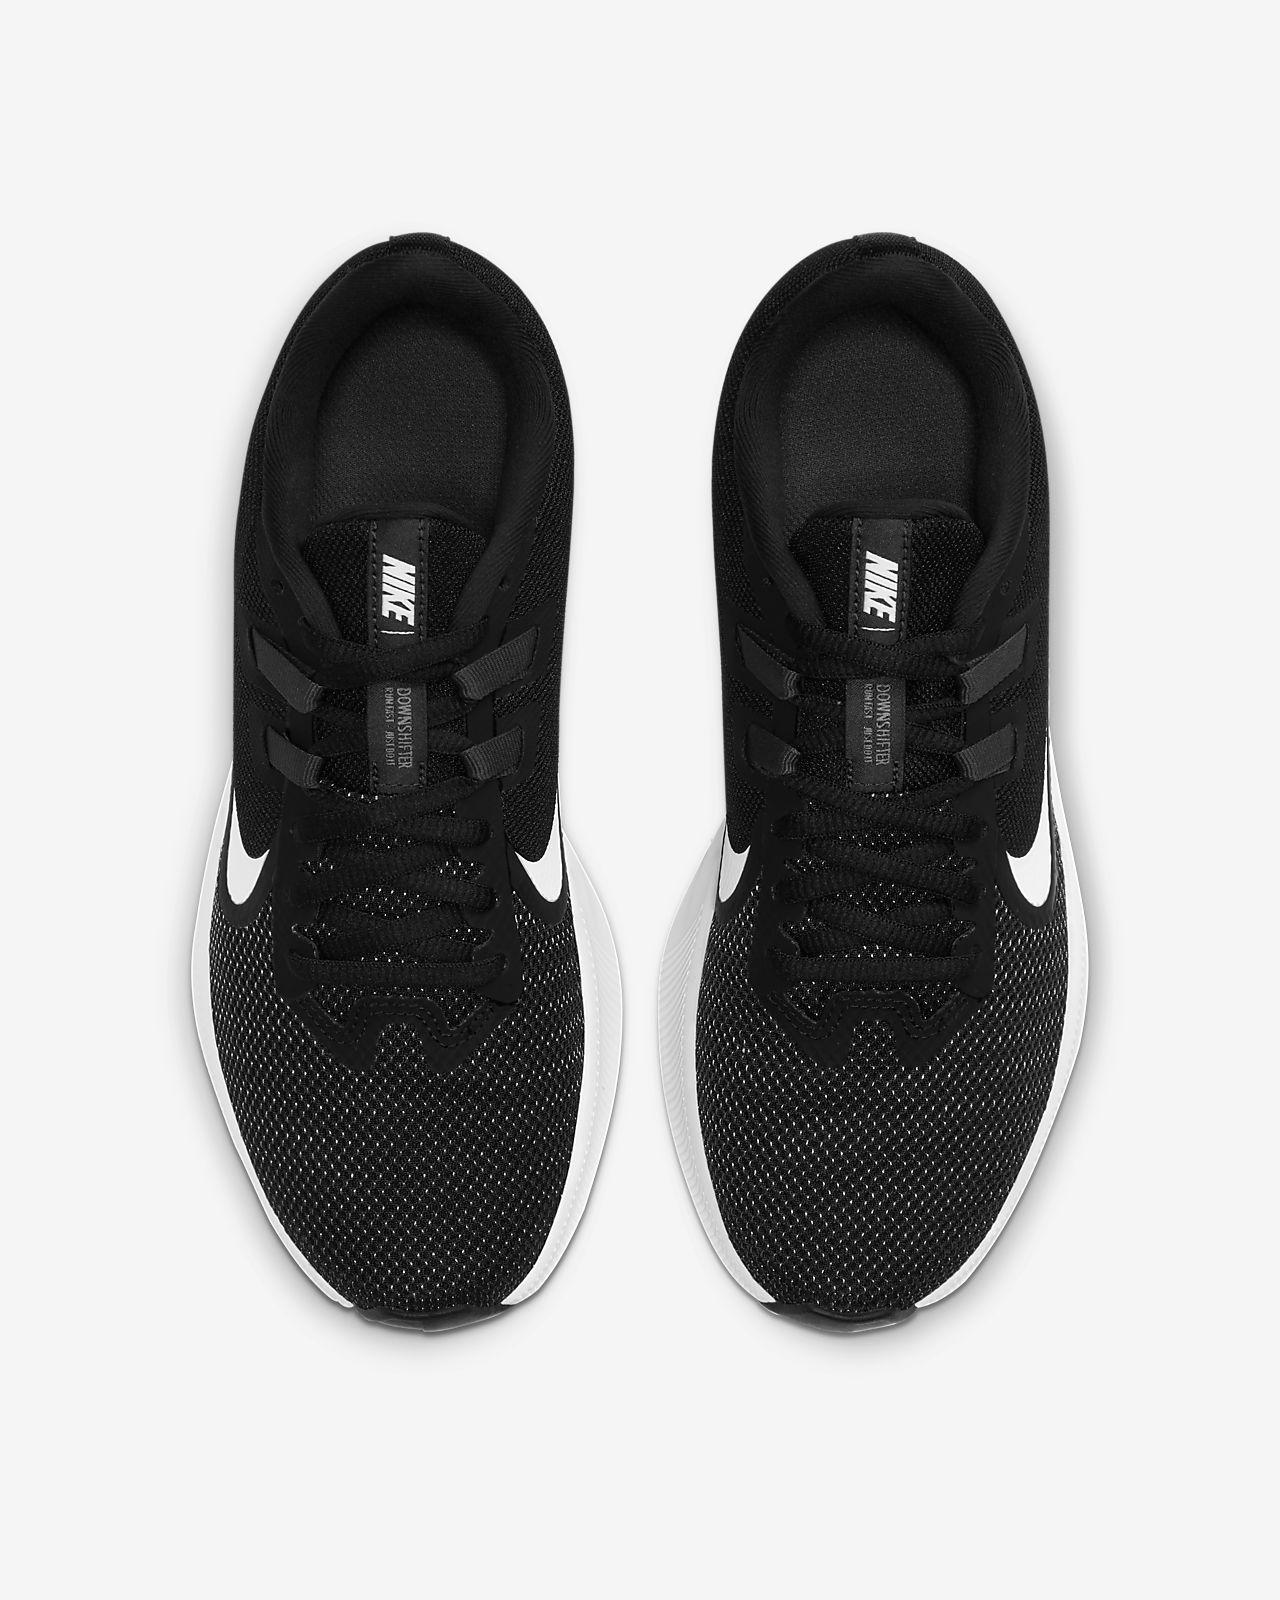 Sorrend Női Cipők Futó cipőkFutócipő Nike Downshifter 7 női